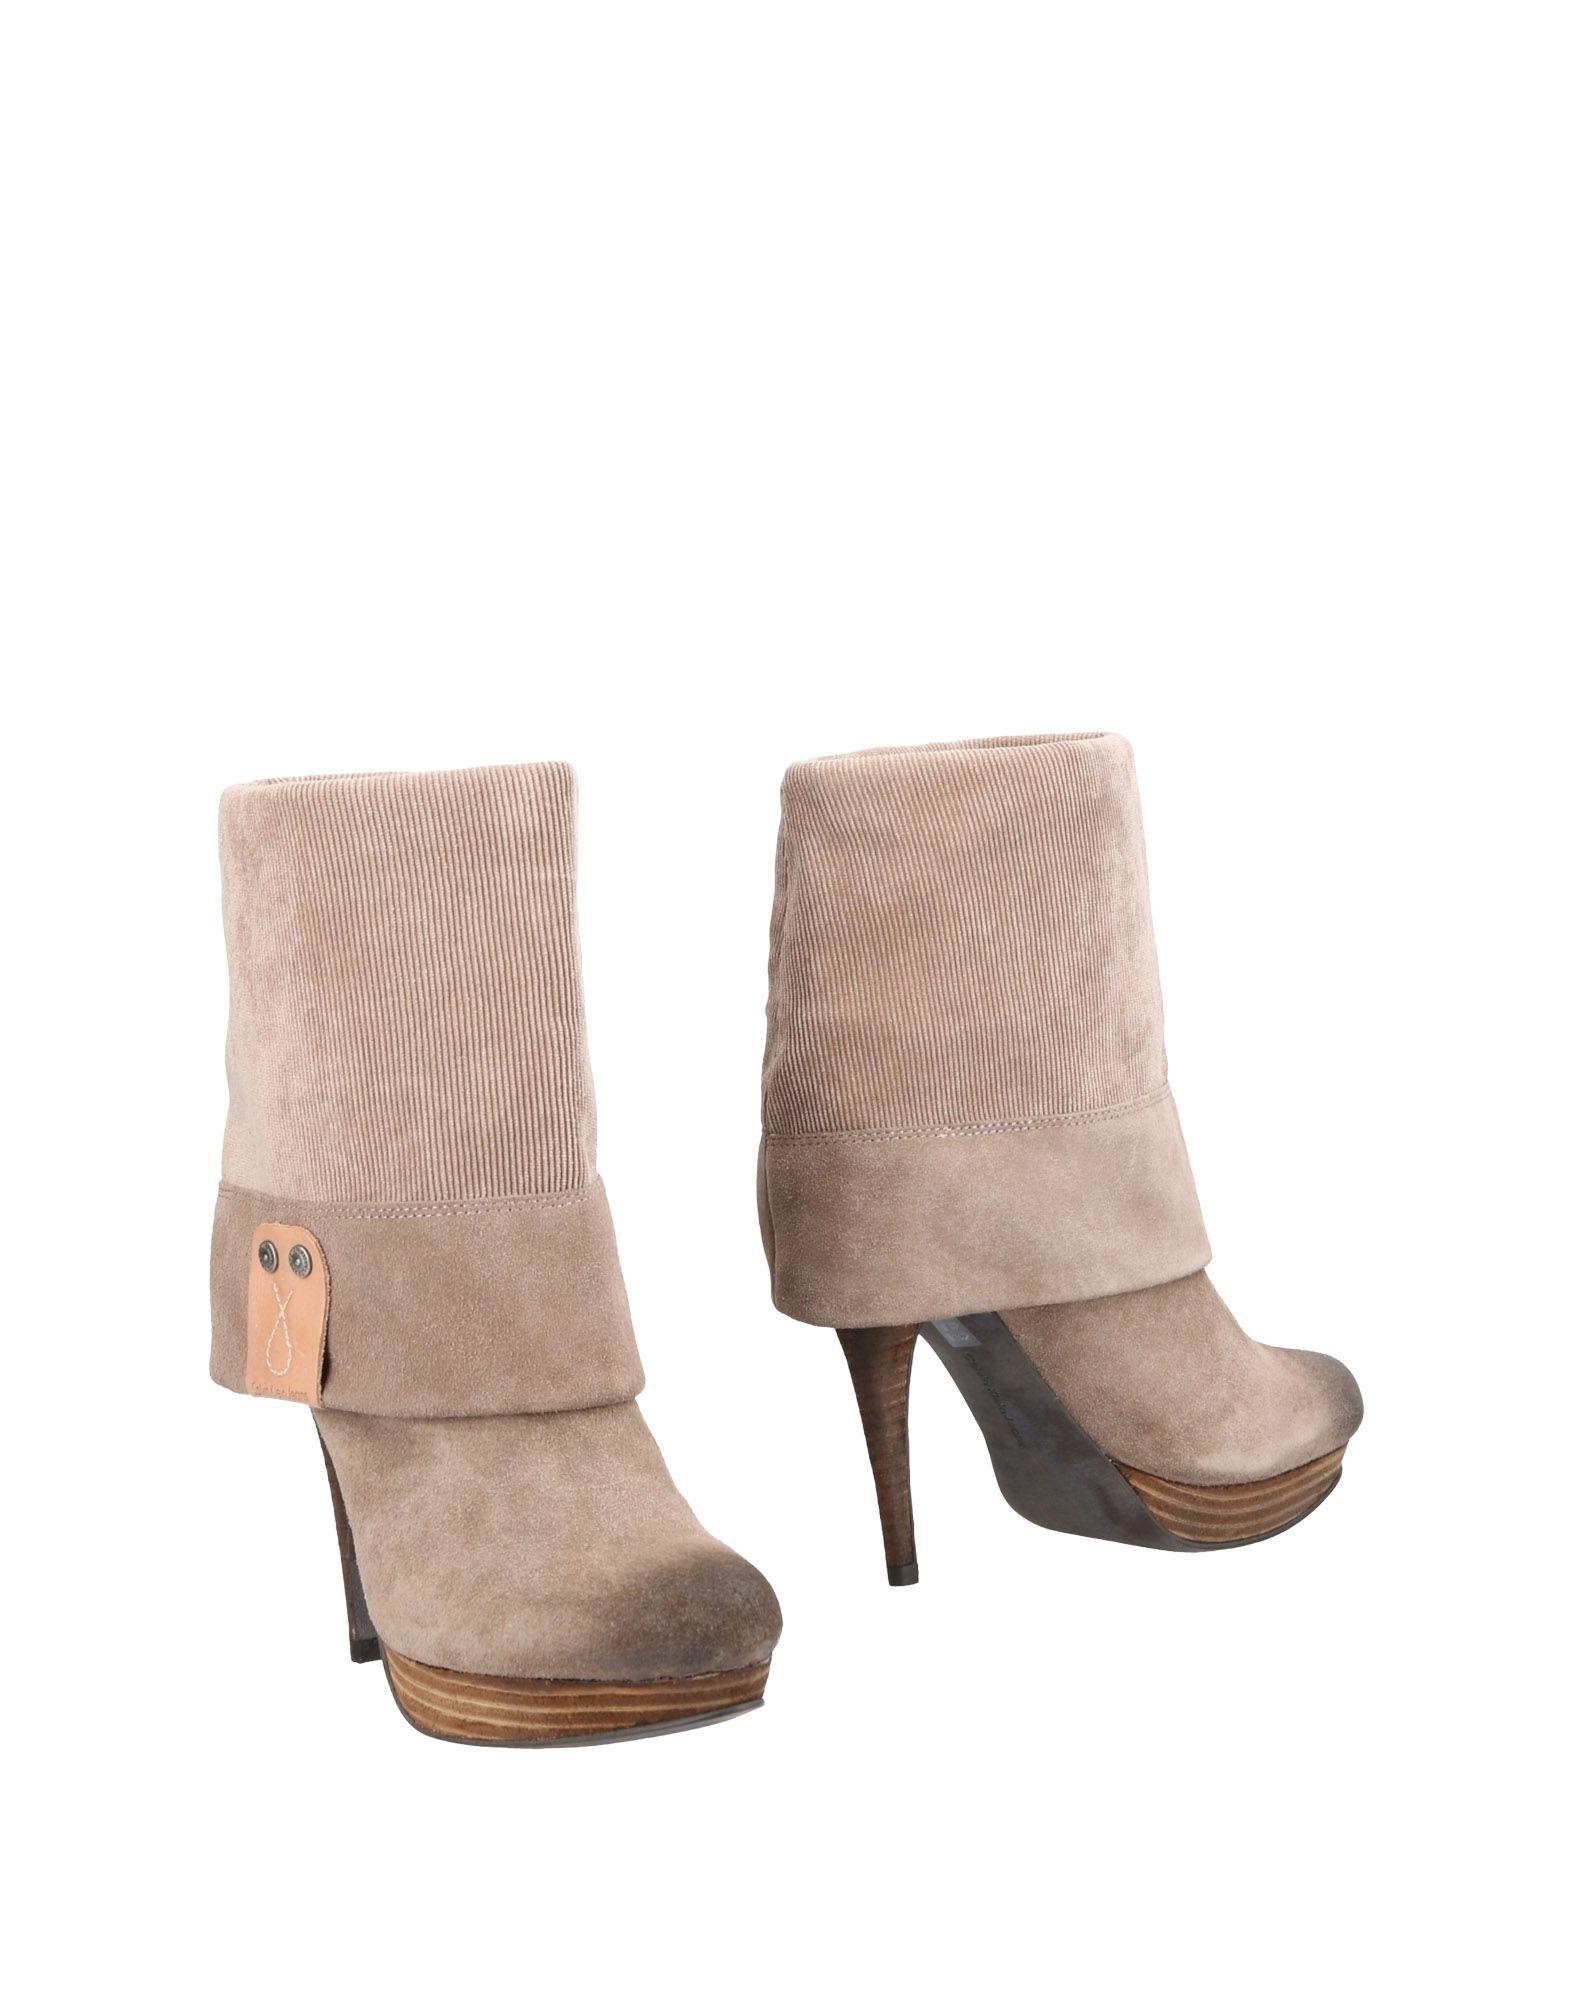 Calvin Klein Jeans Stiefelette Damen Schuhe  11485254ED Neue Schuhe Damen df68b0